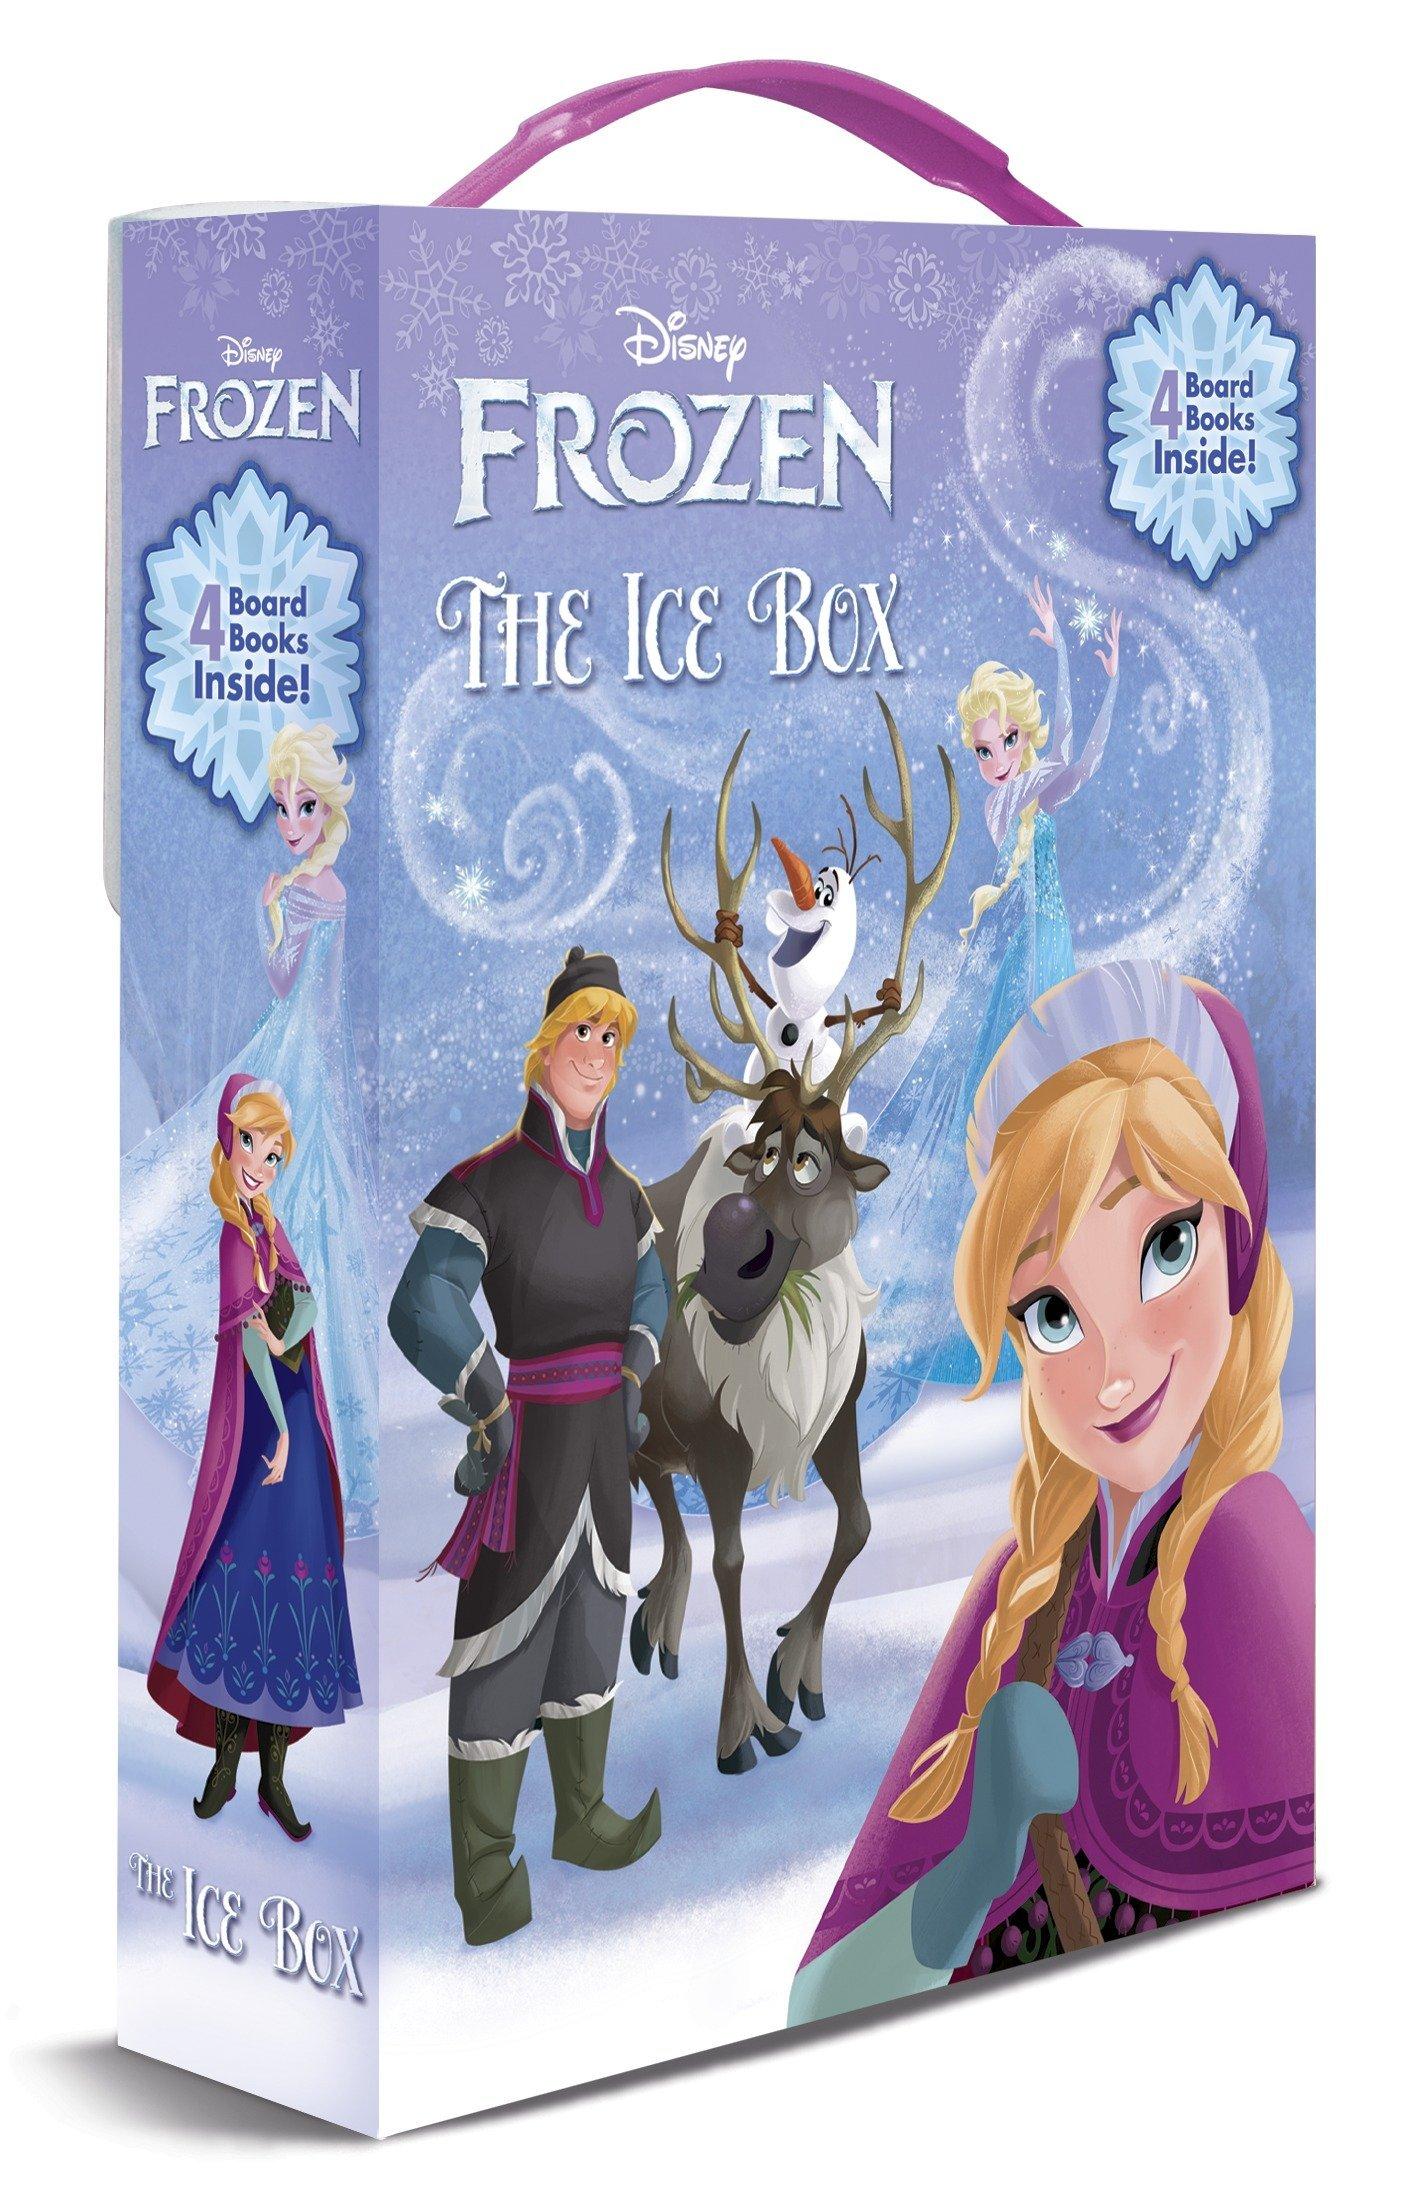 Ice Box The Frien Courtney Carbone Rh Disney 9780736431286